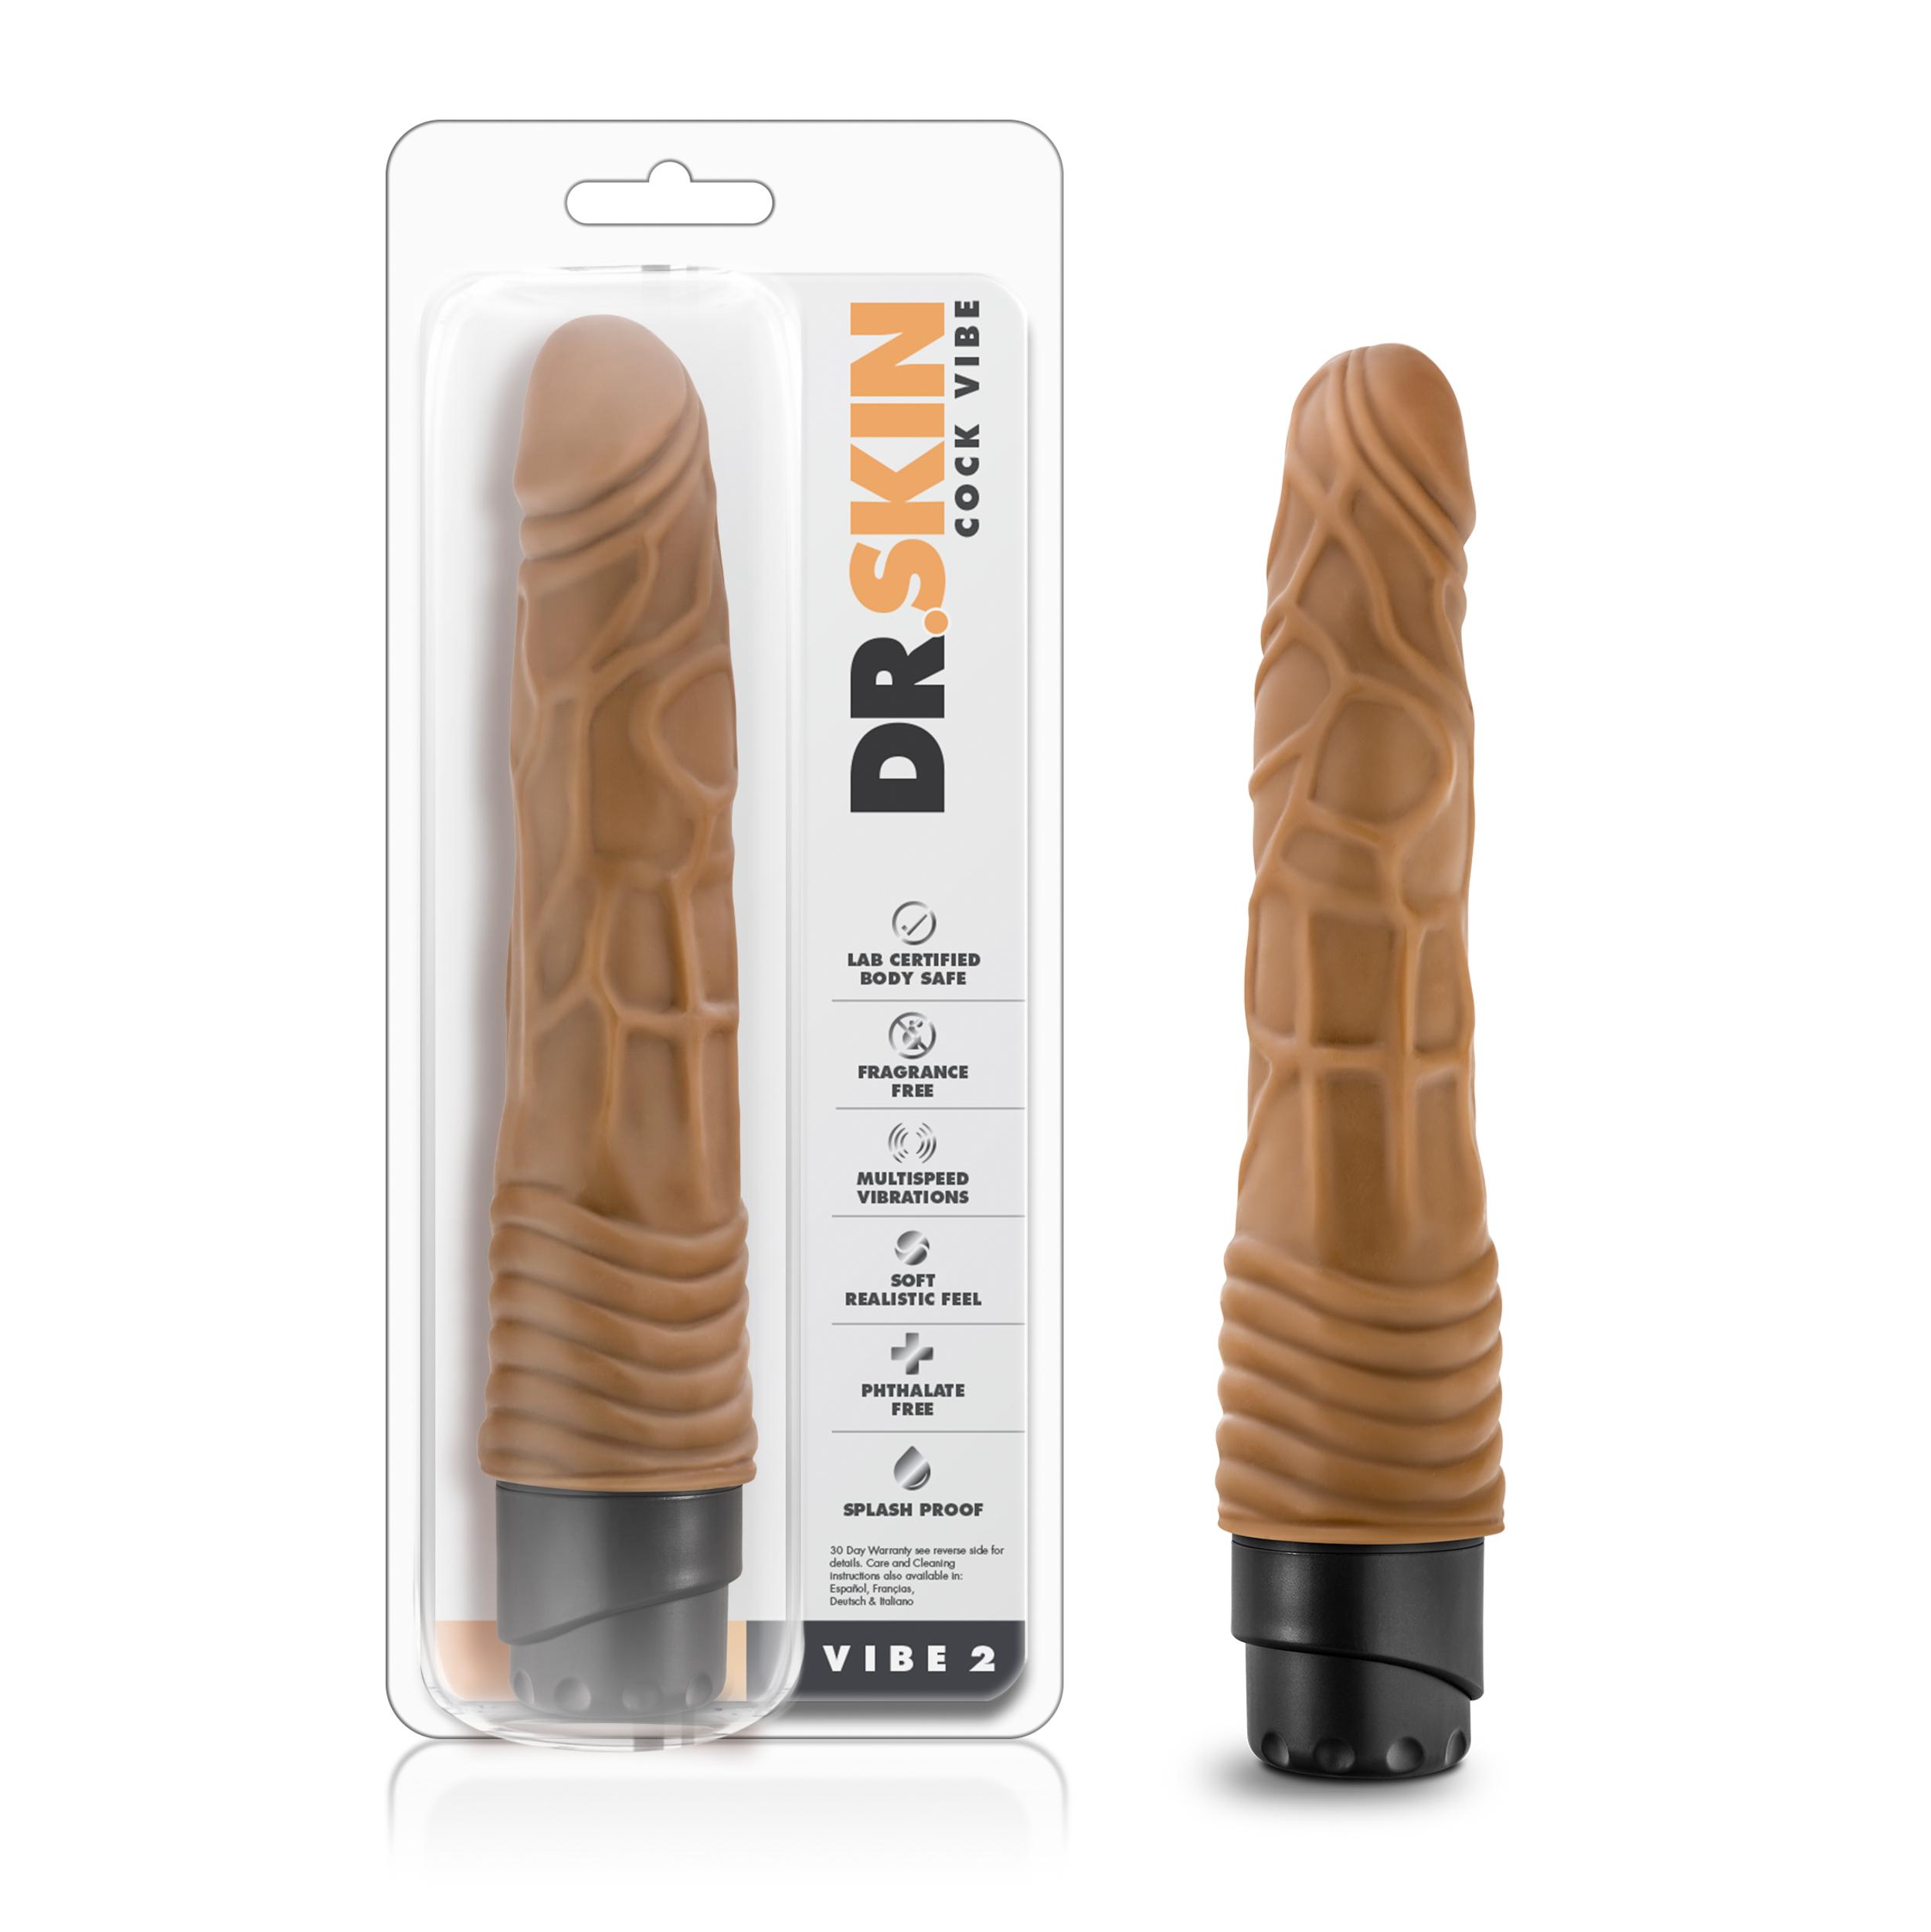 Dr. Skin - Cock Vibe 2 - 9 inch vibrating cock - Mocha